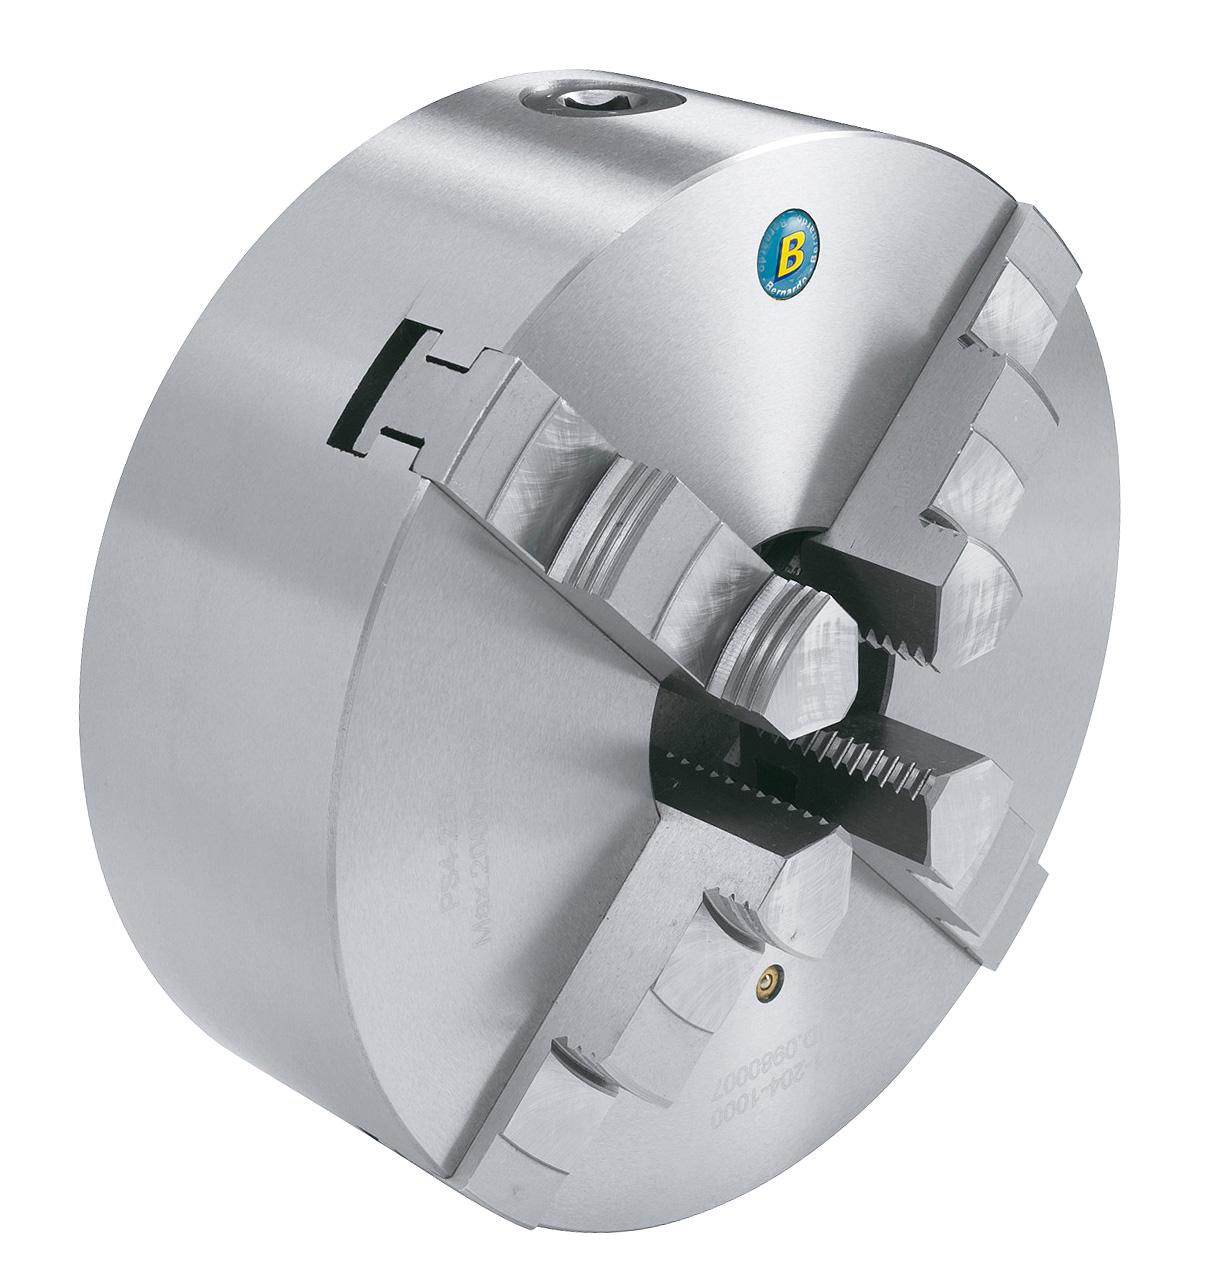 4 bakket centrerpatron standard DK12-400/D6